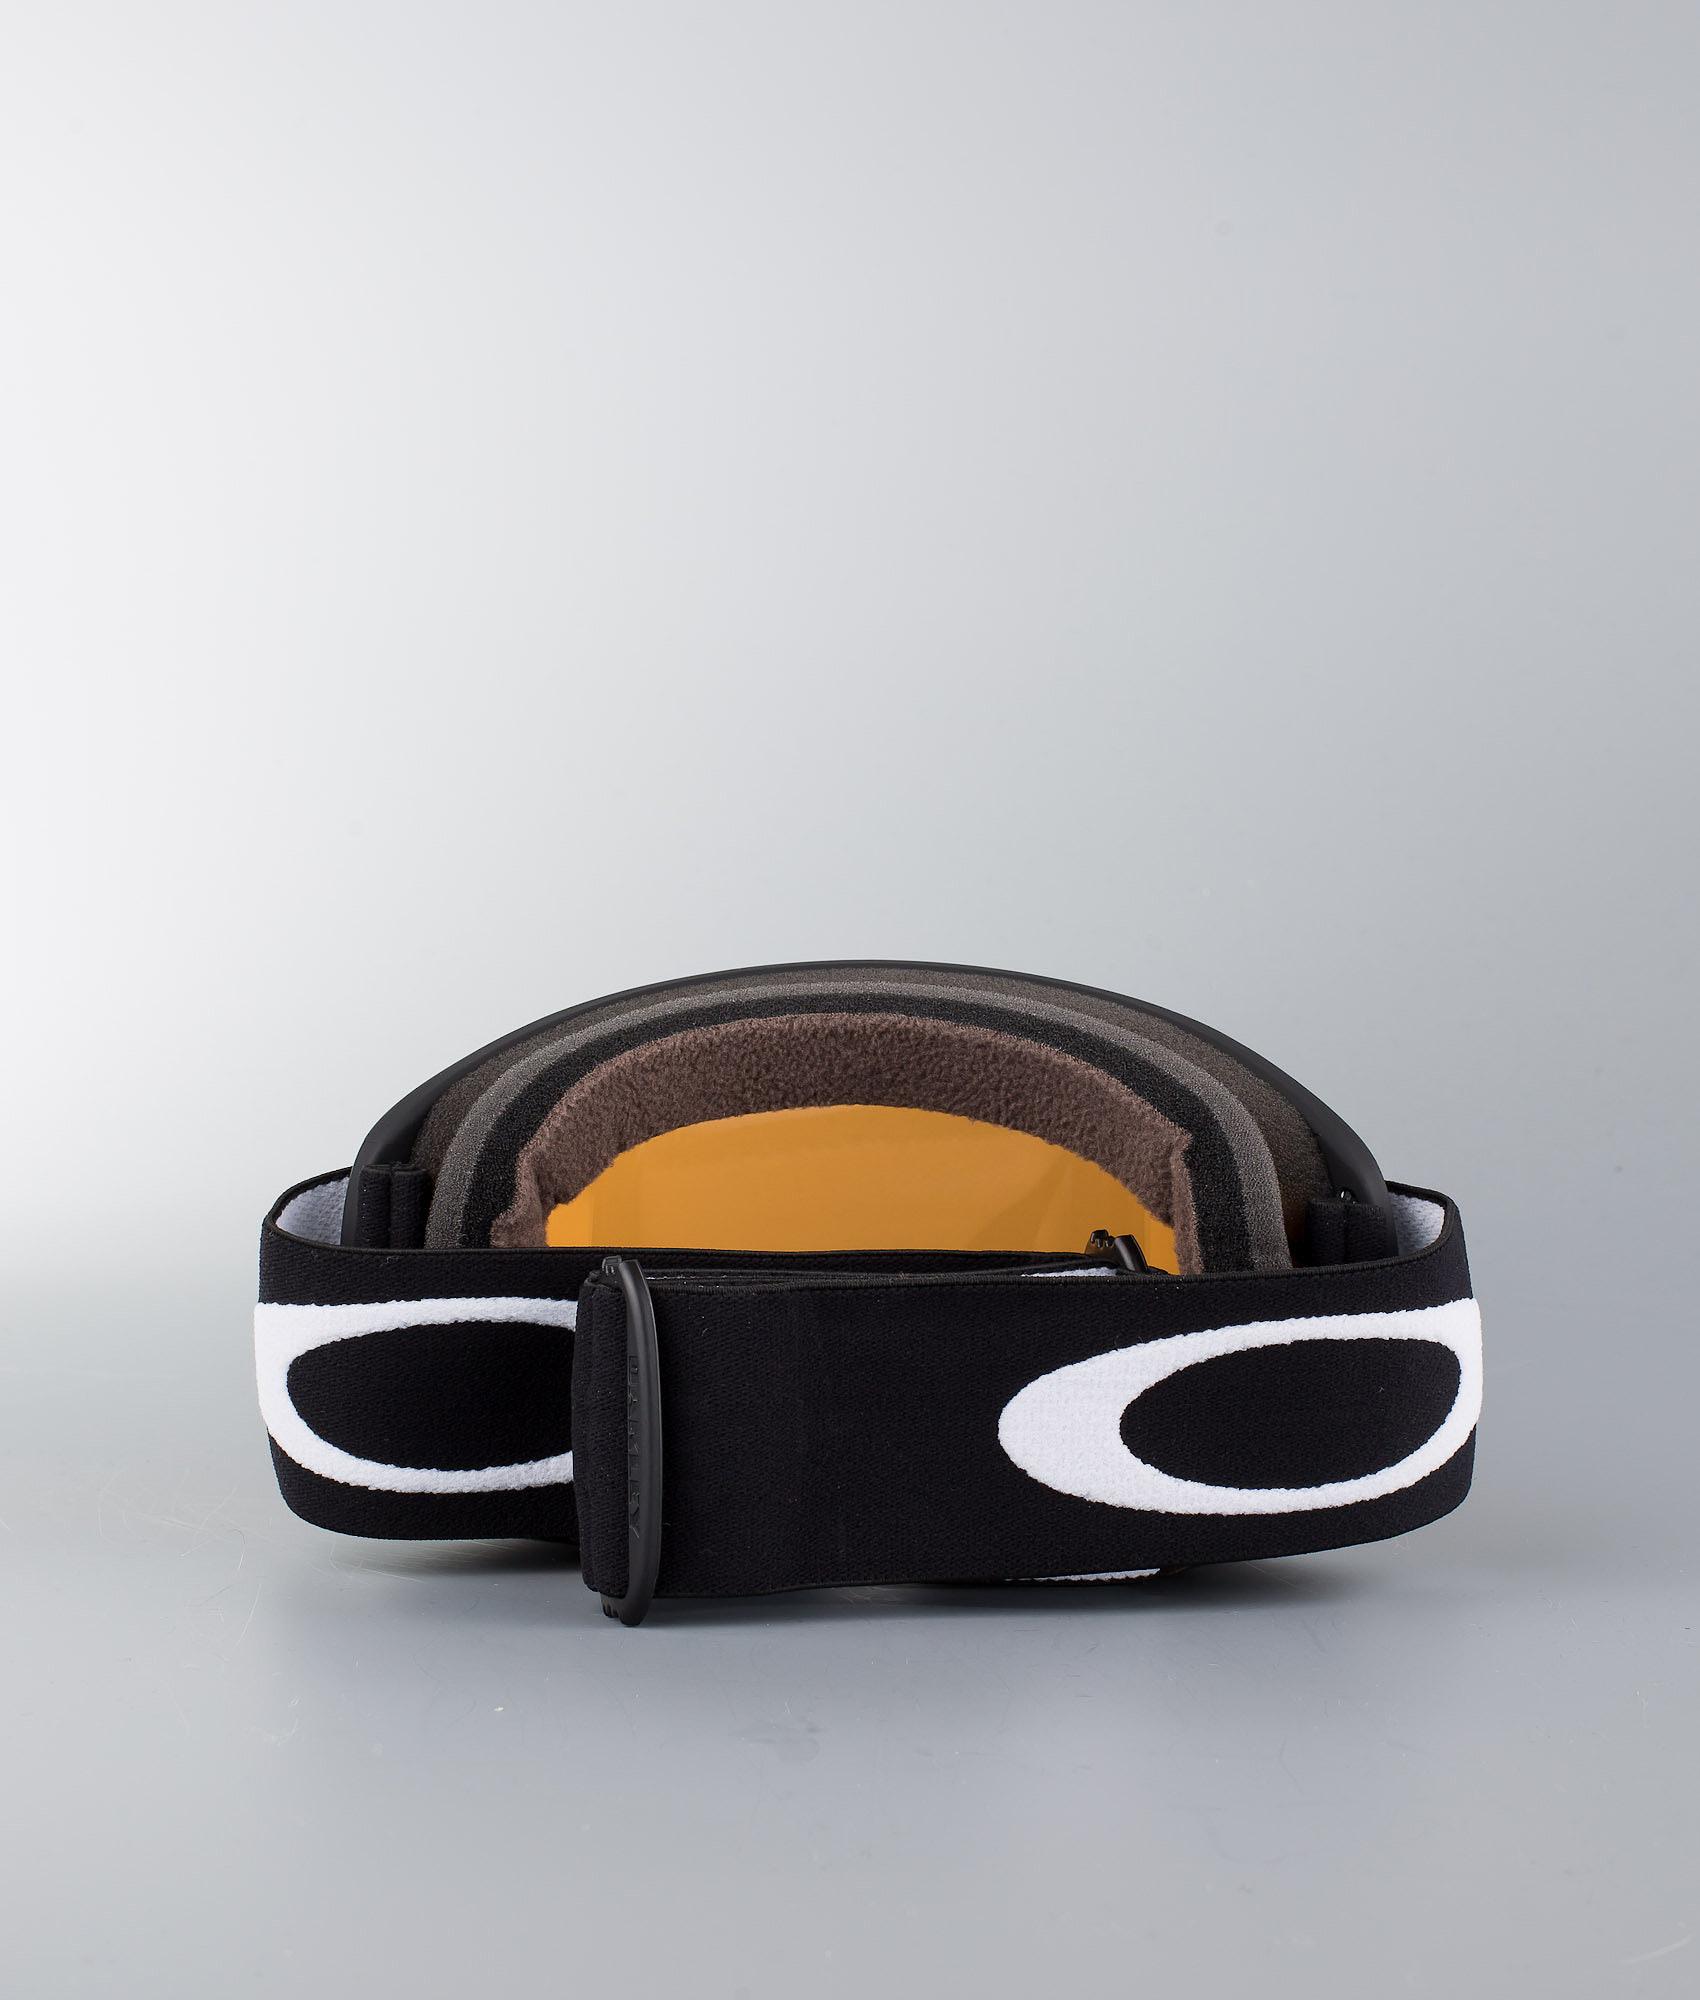 b341aa6d6374d Oakley O Frame 2.0 XL Ski Goggle Matte Black W Persimmon - Ridestore.com